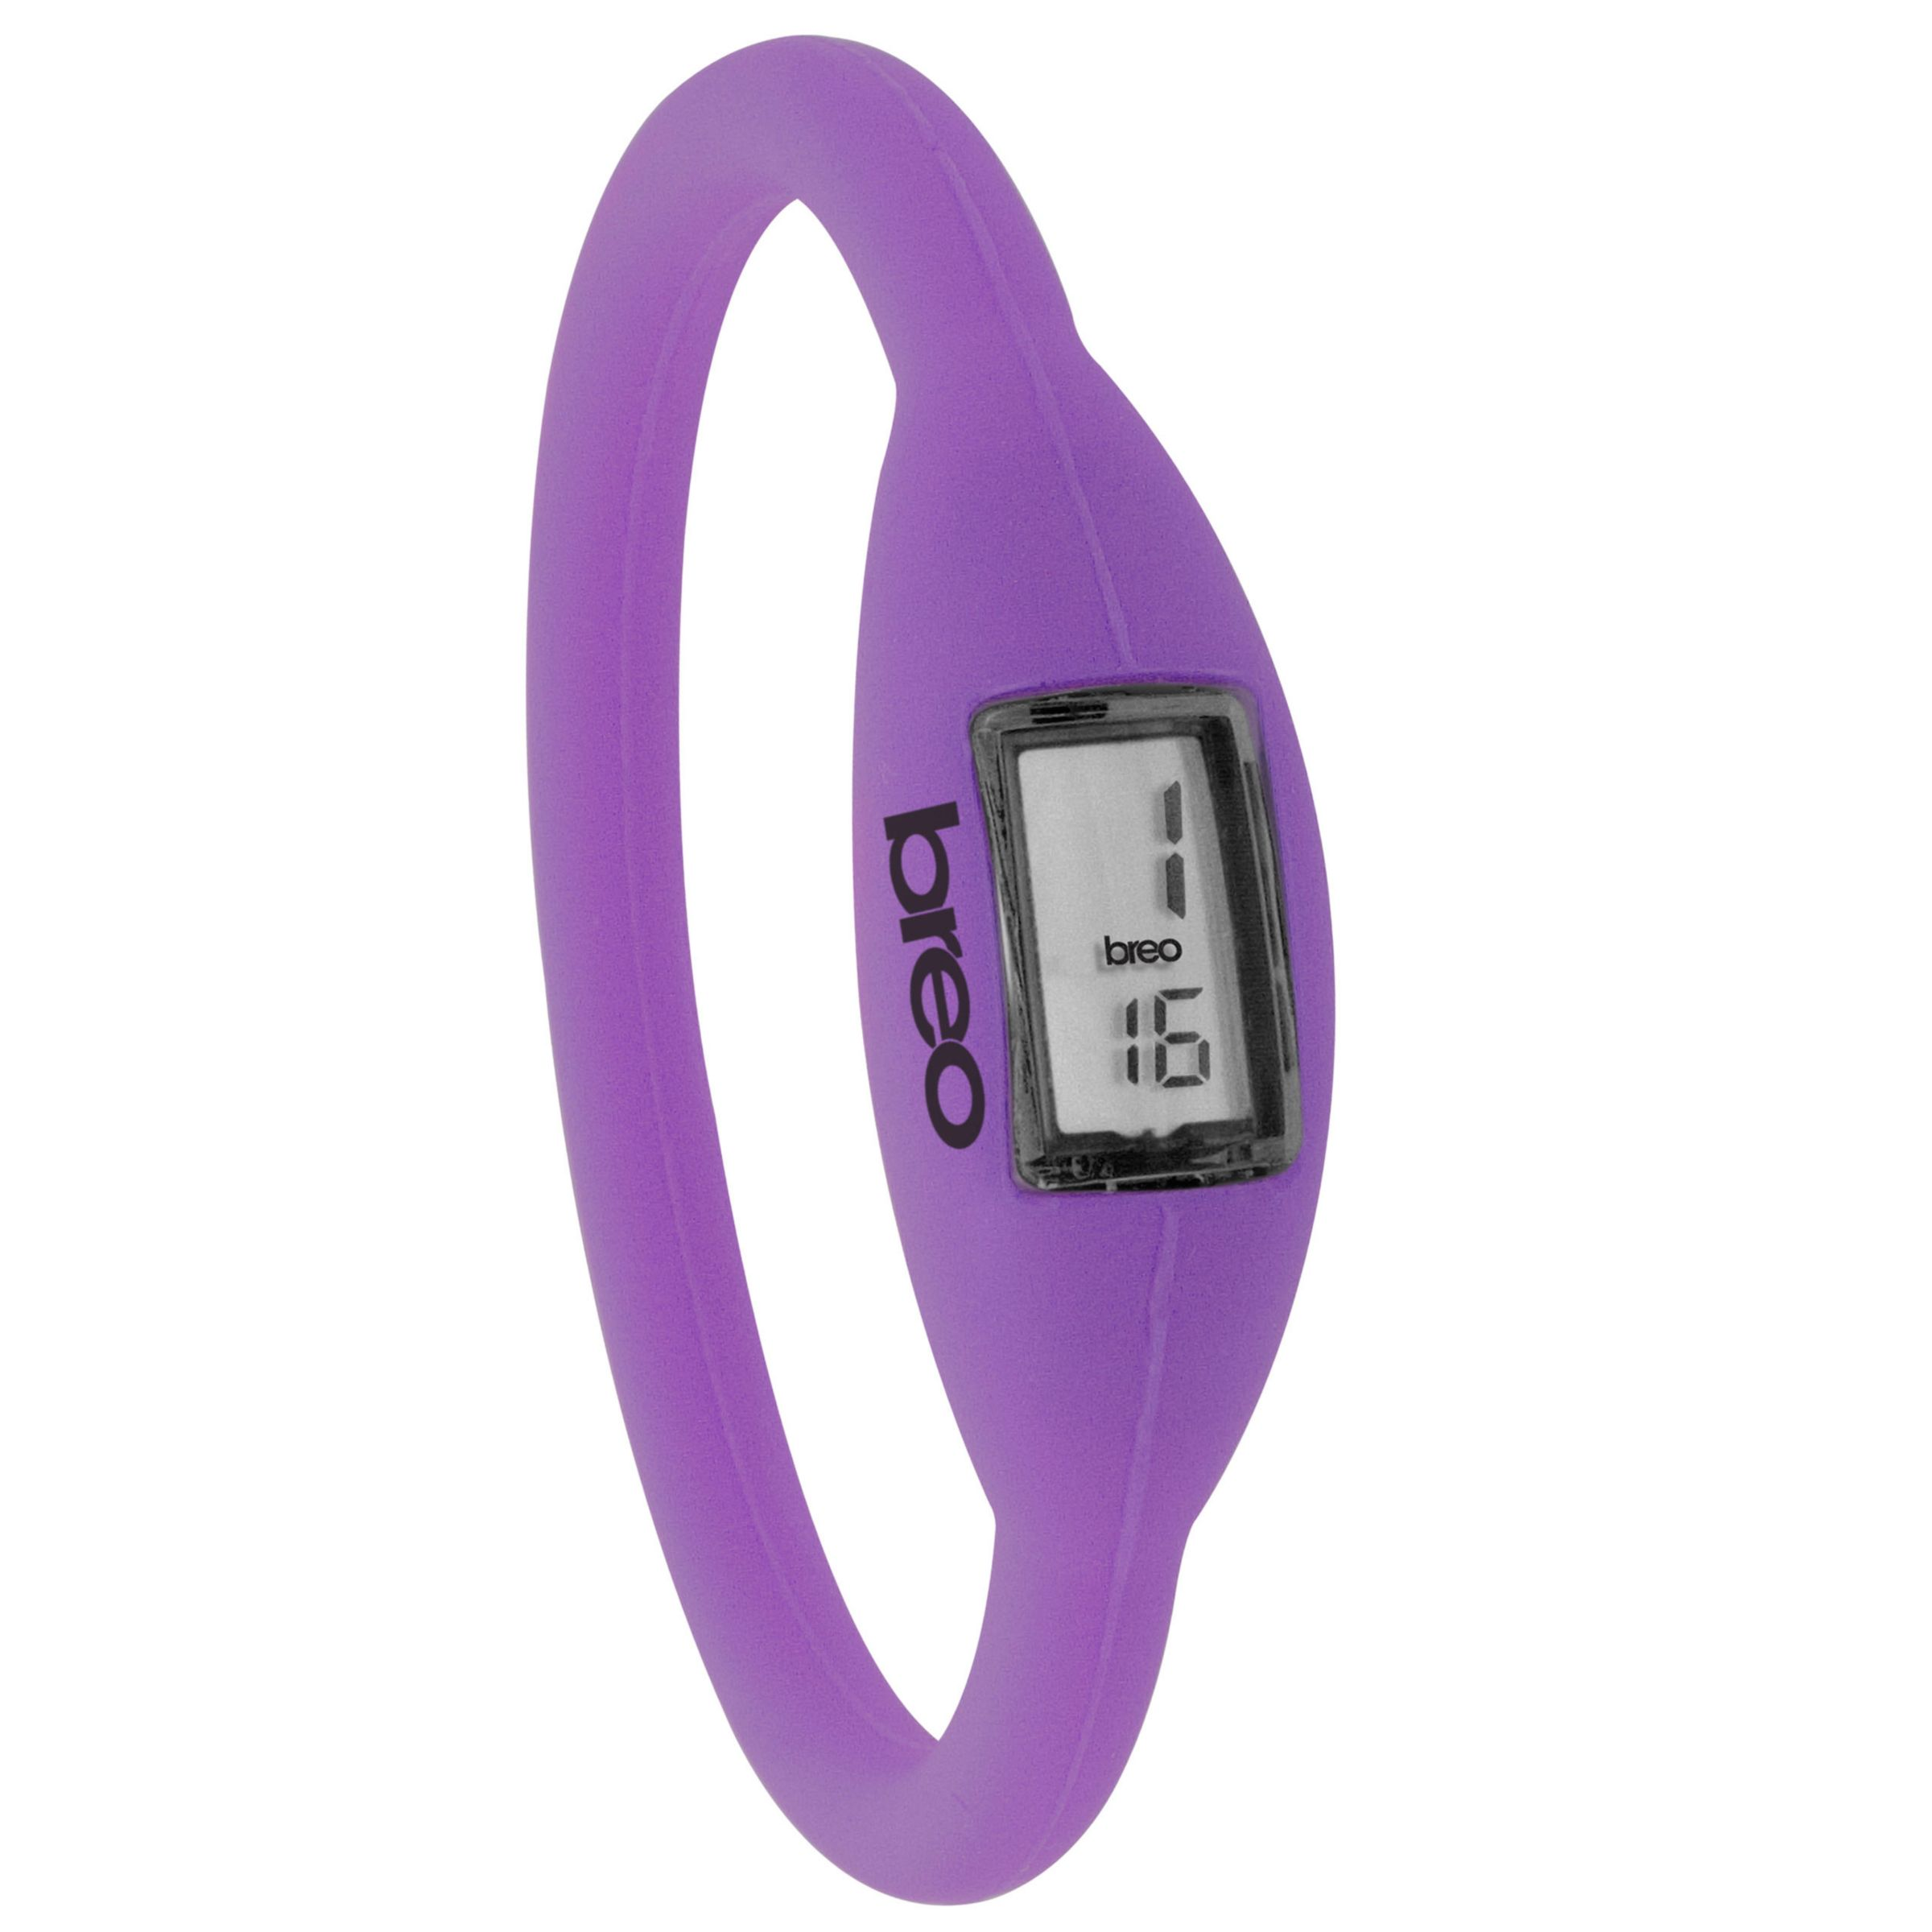 Breo Roam B-TI-RO4 Digital Sports Watch, Purple